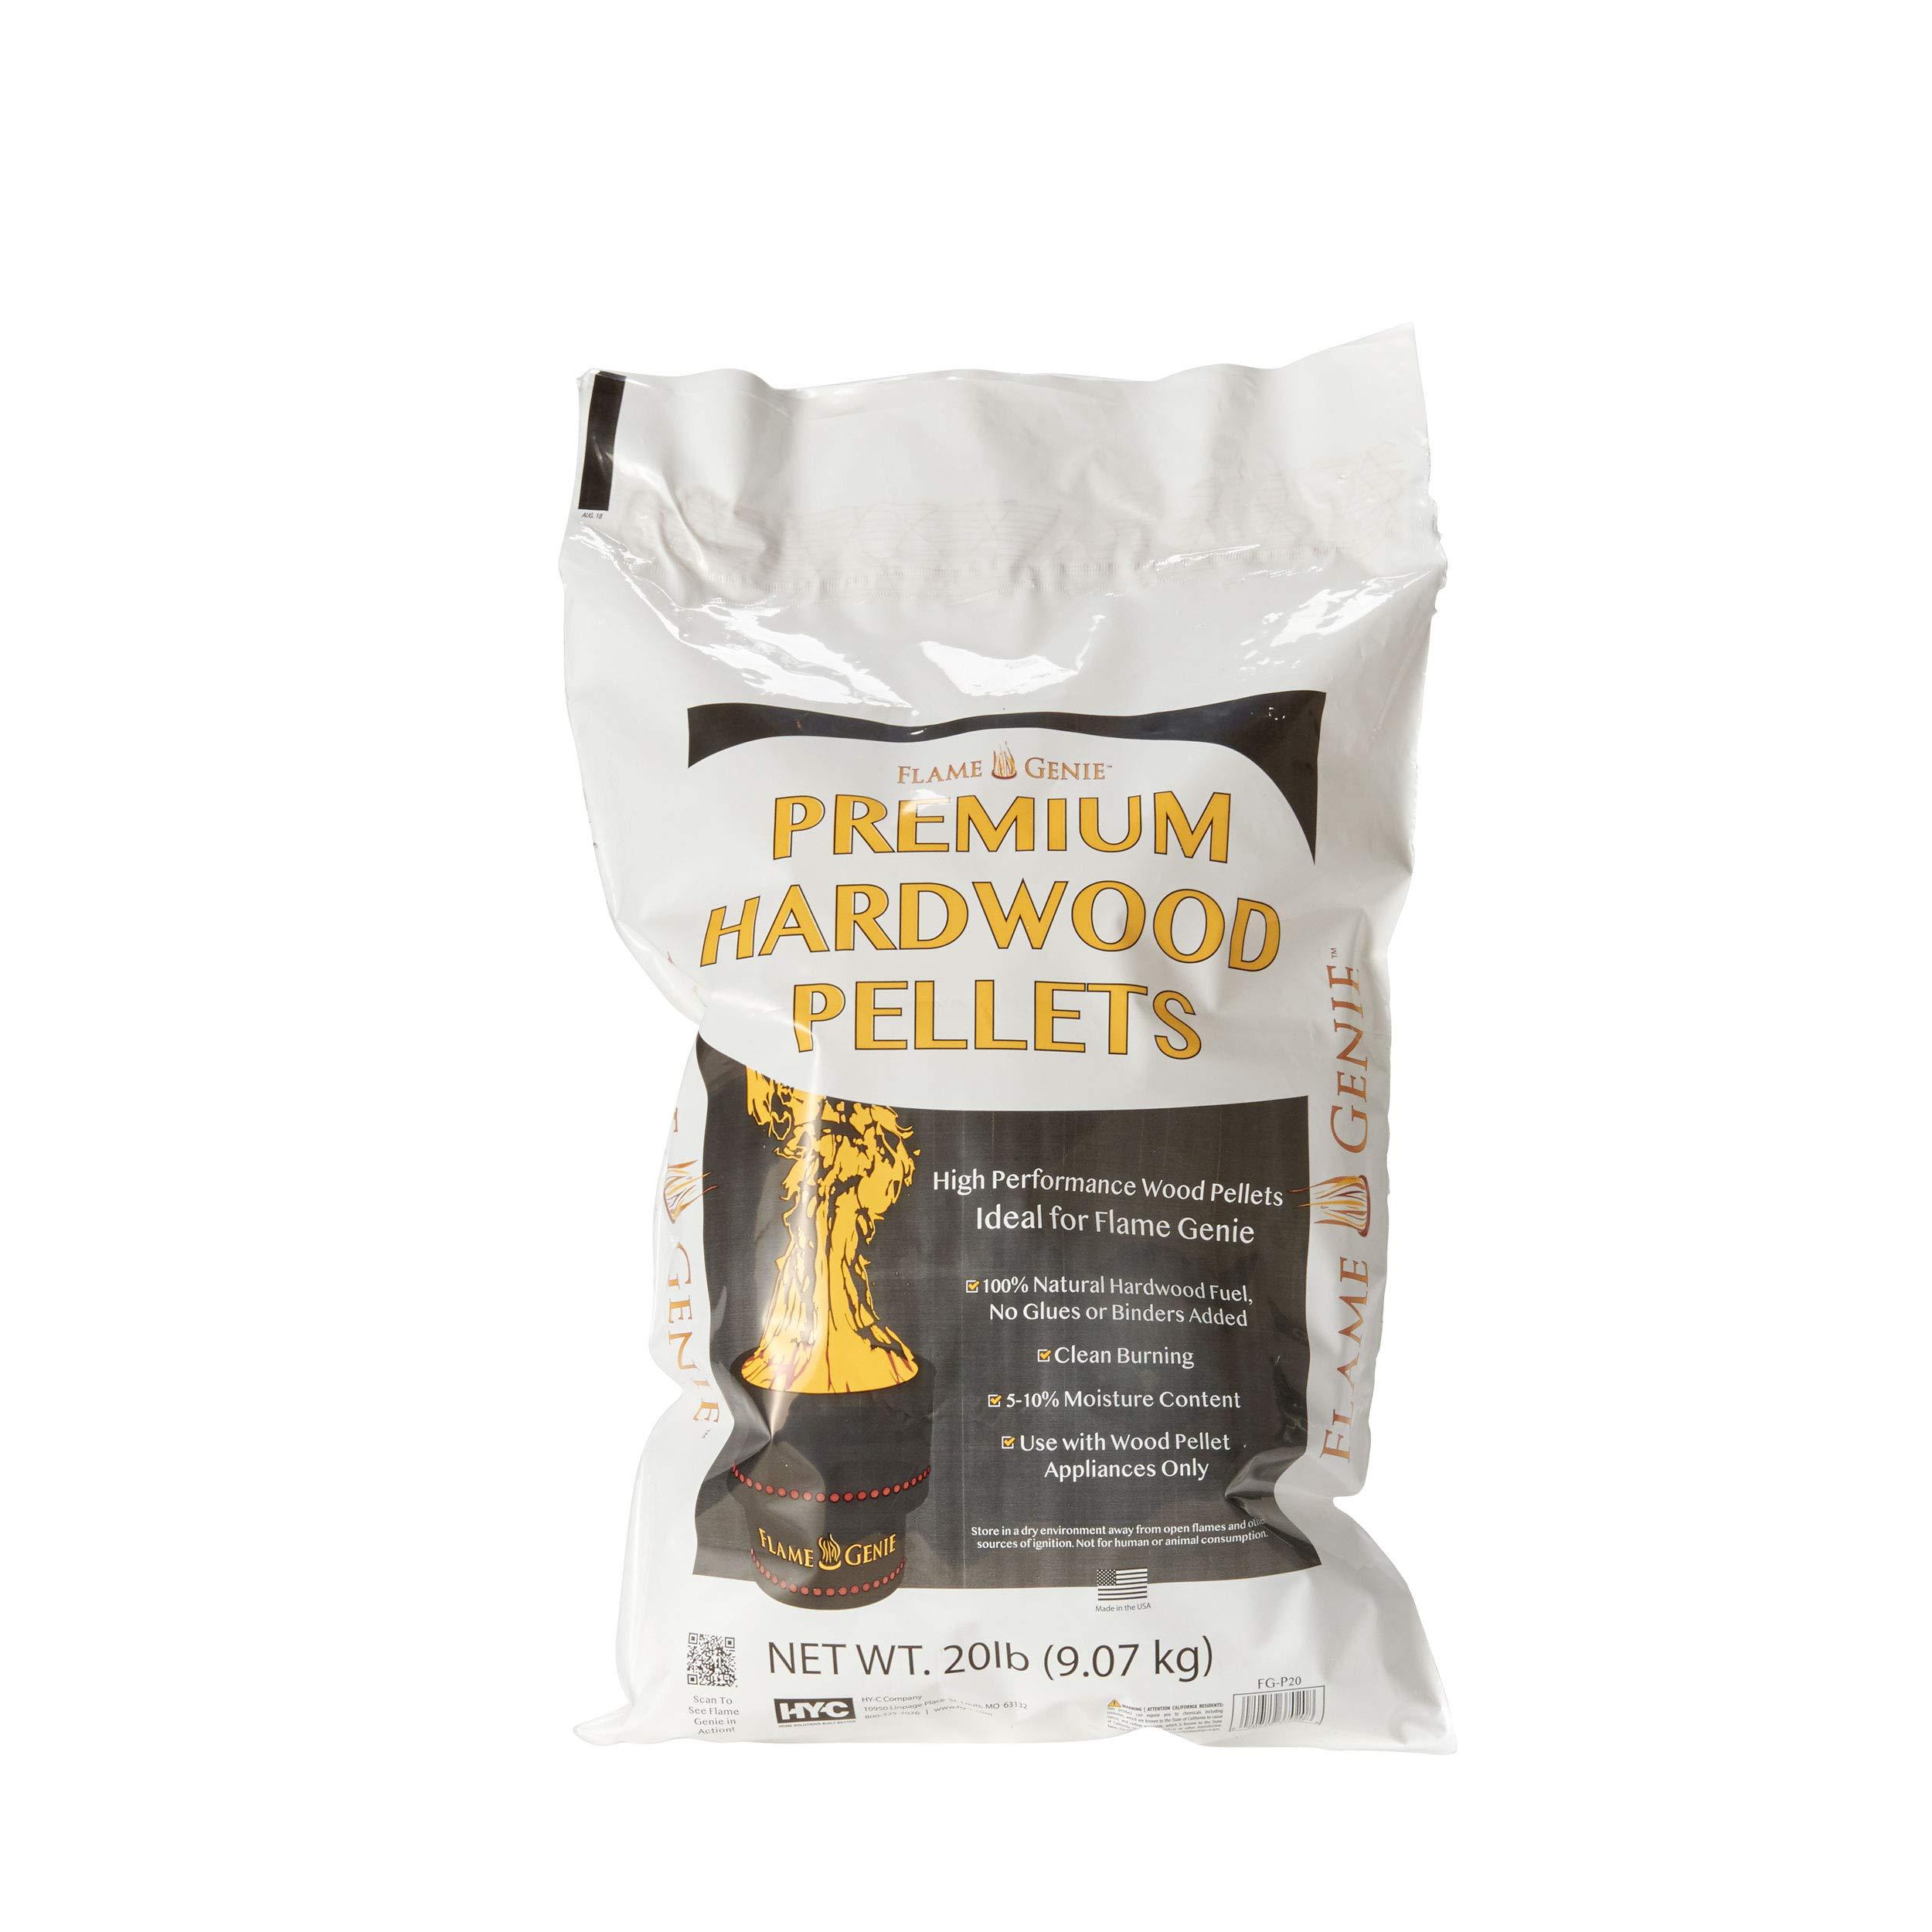 Flame Genie FG-P20 Premium Wood Pellets for Fire Pits, 20 Pound Pack Black